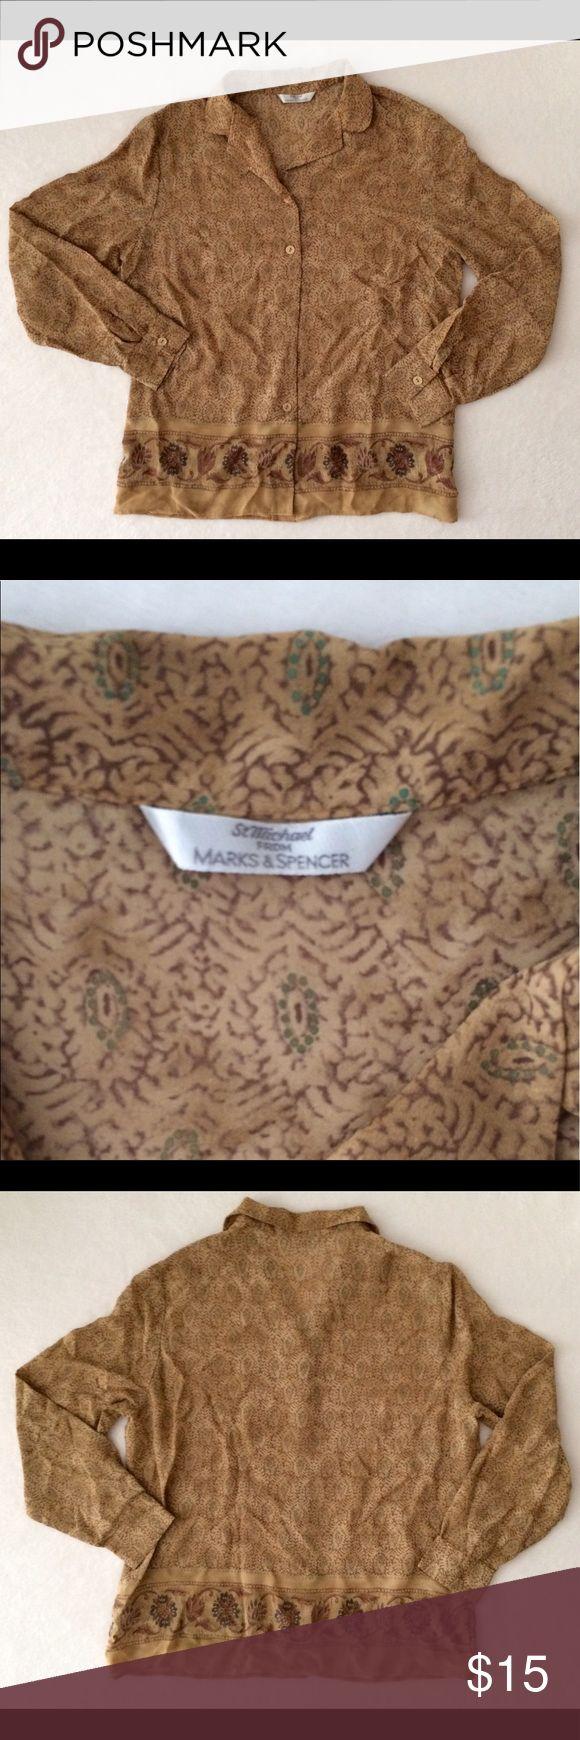 "Marks & Spencer Women's beige blouse size 12 St. Michael for Marks & Spencer. Beige Women's Blouse. Size 12. Materials: 100% Viscose.                                                                   Measurements: CHEST 21"" ARM LENGTH 29"" CUFF 4"" TOTAL LENGTH 24,5"" Marks & Spencer Tops Blouses"